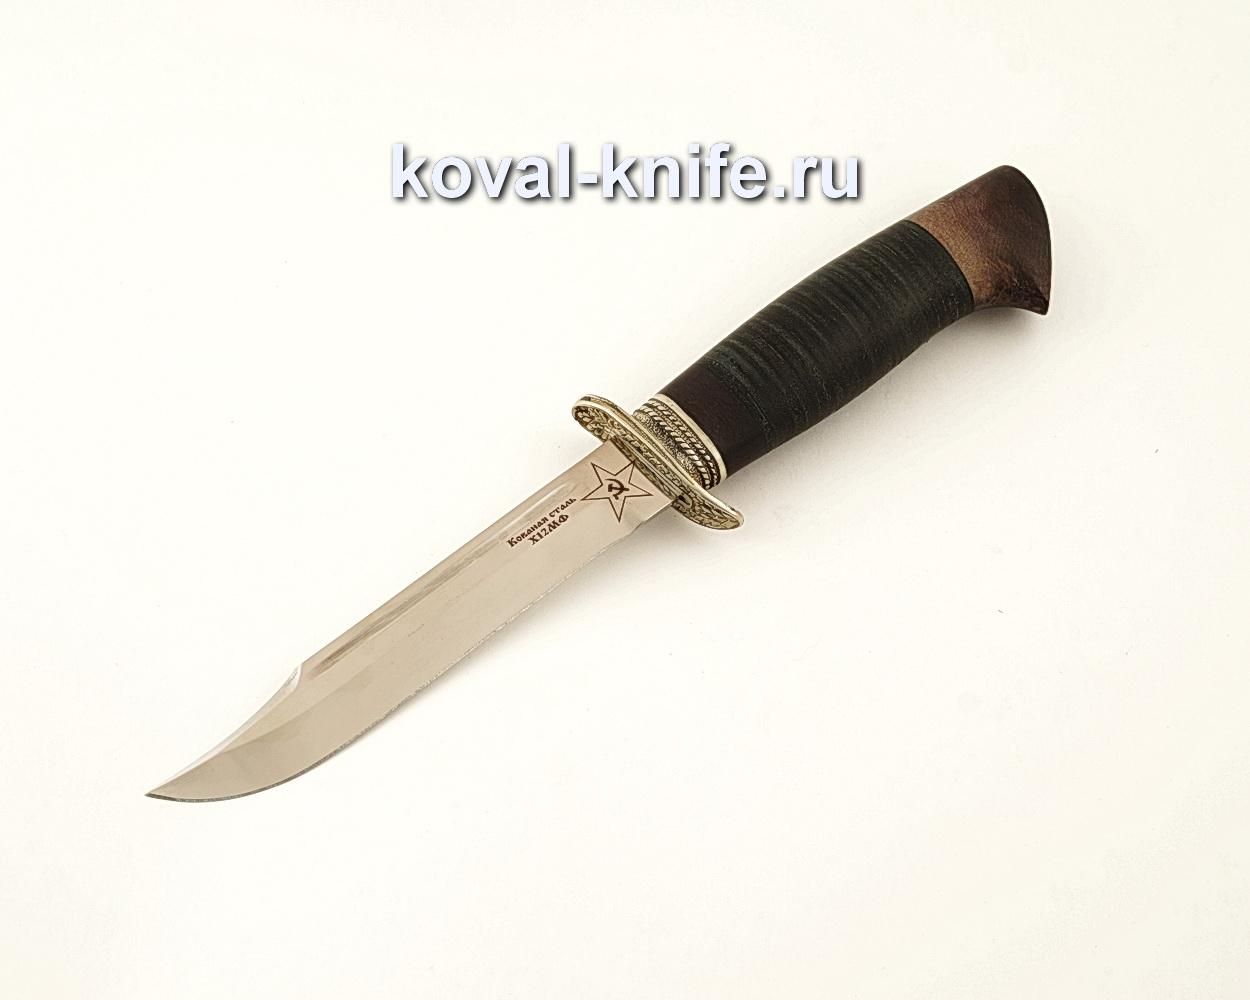 Нож Штрафбат – реплика ножа НР40 из кованой стали Х12МФ с рукоятью из кожи  A623